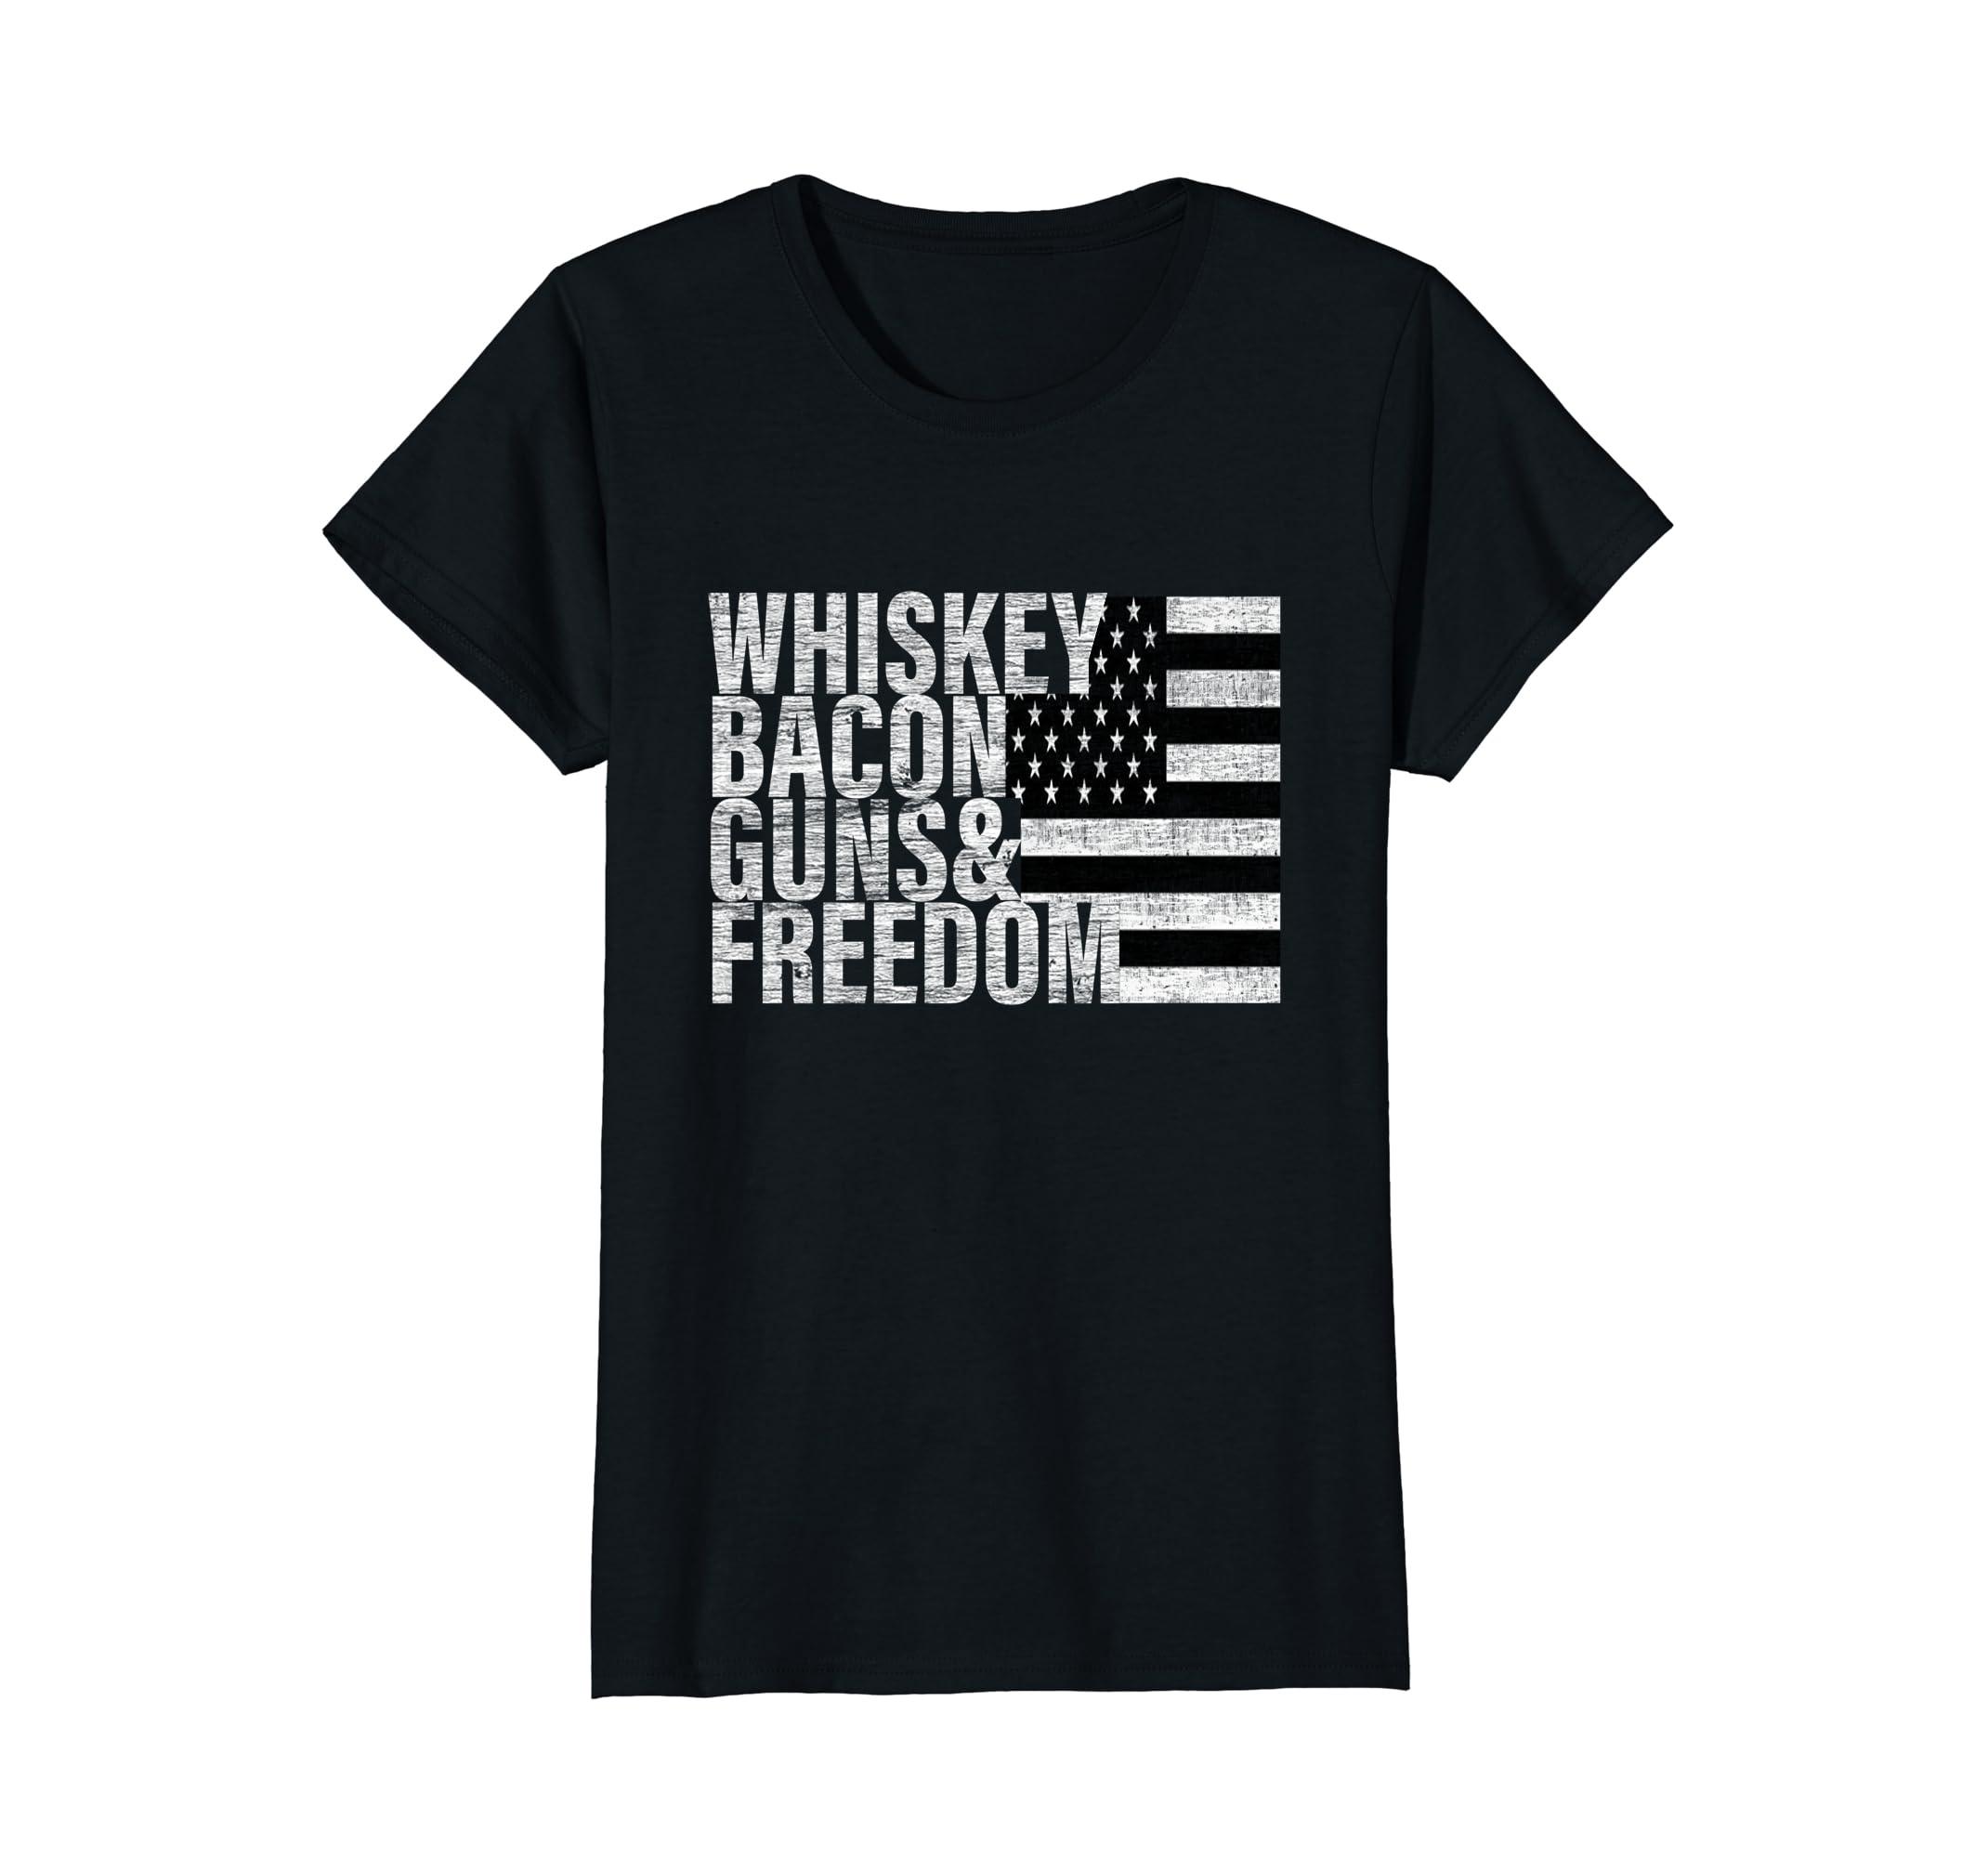 Amazon.com: Whiskey Bacon Guns & Freedom T-shirt Flag Tee: Clothing